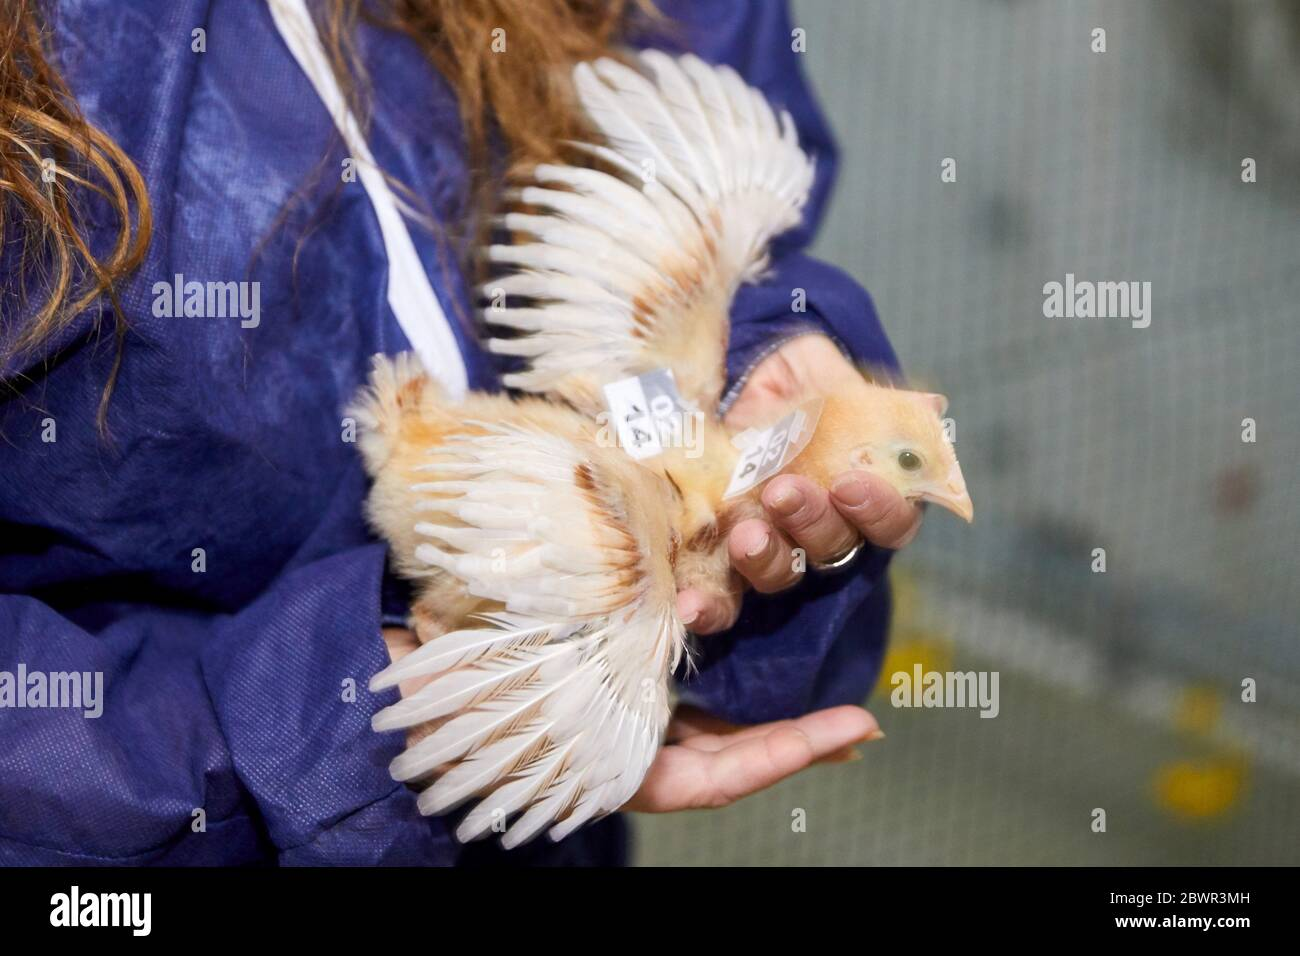 Ricerca animale, Uccelli, allevamento di polli, Araba, Paesi Baschi, Spagna Foto Stock